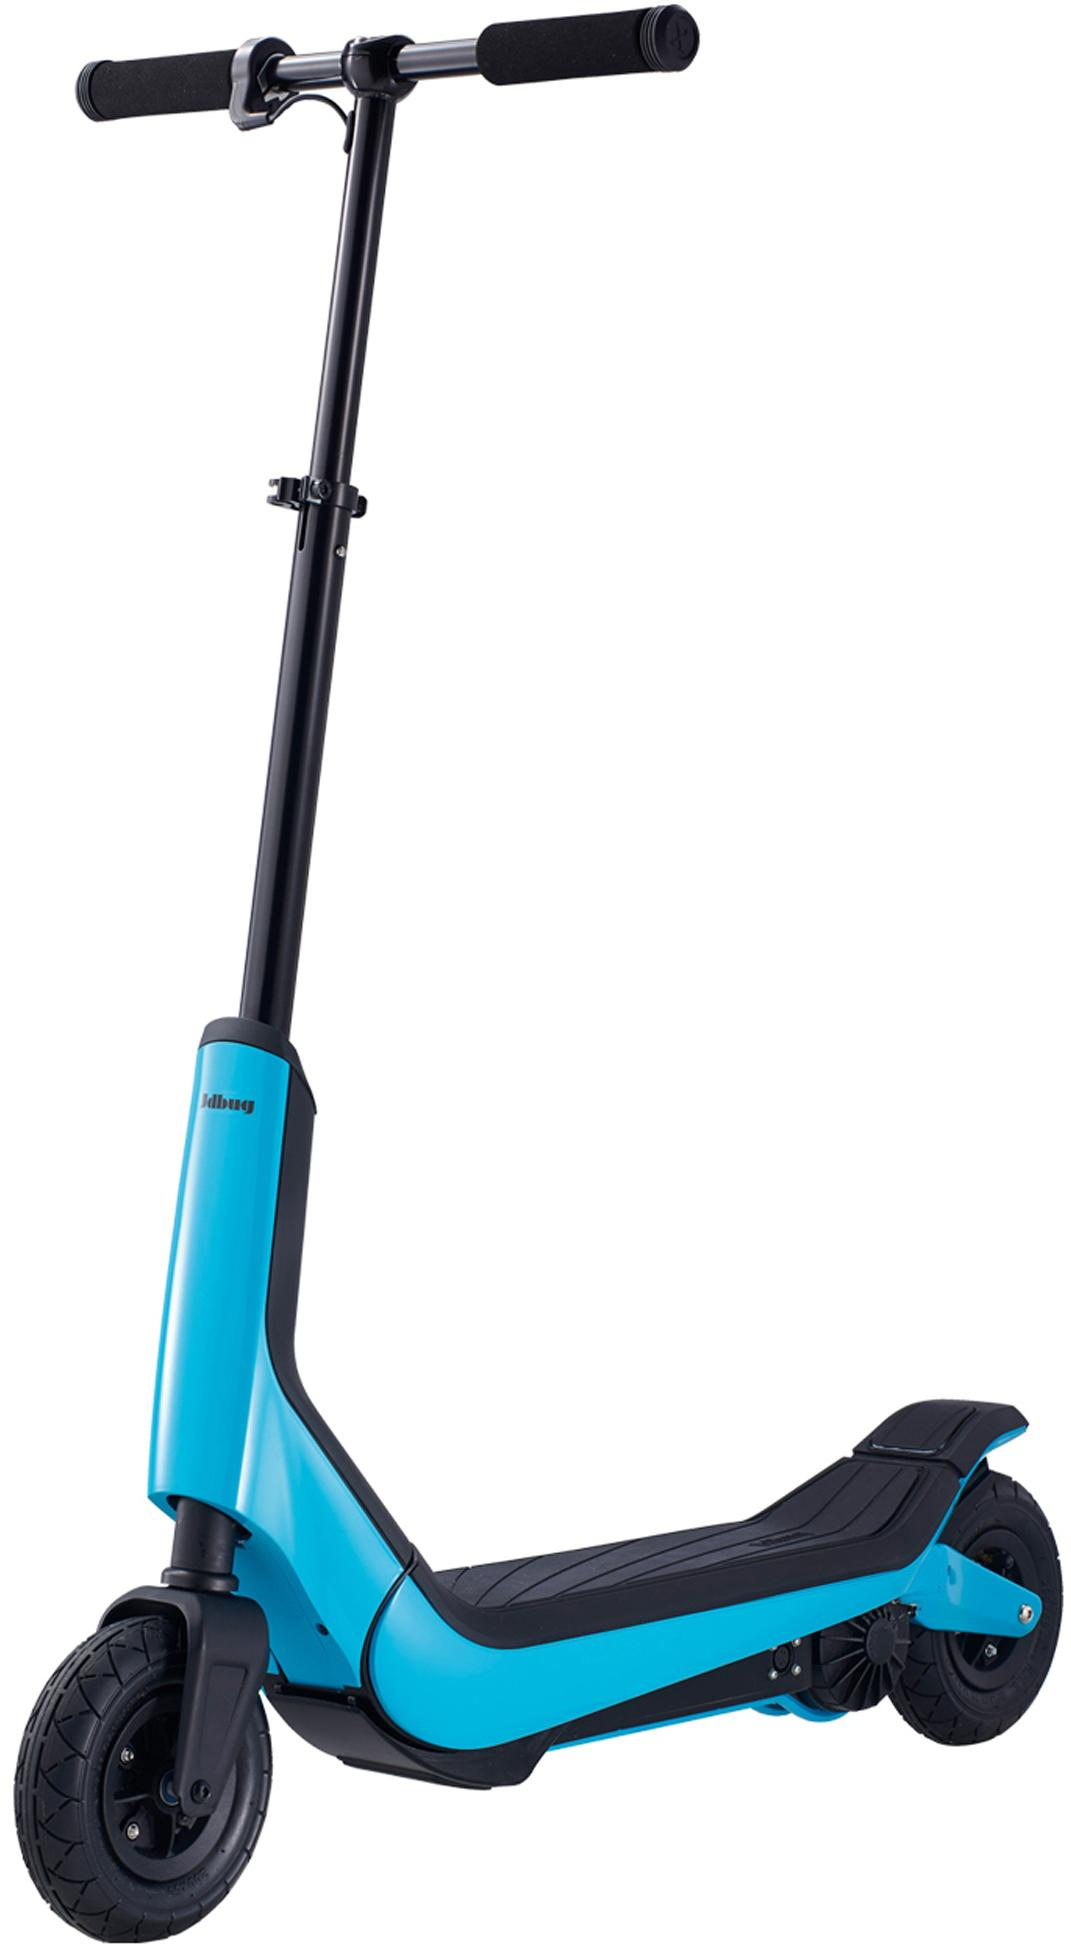 jd bug e scooter sports663410?w\u003d637\u0026h\u003d403